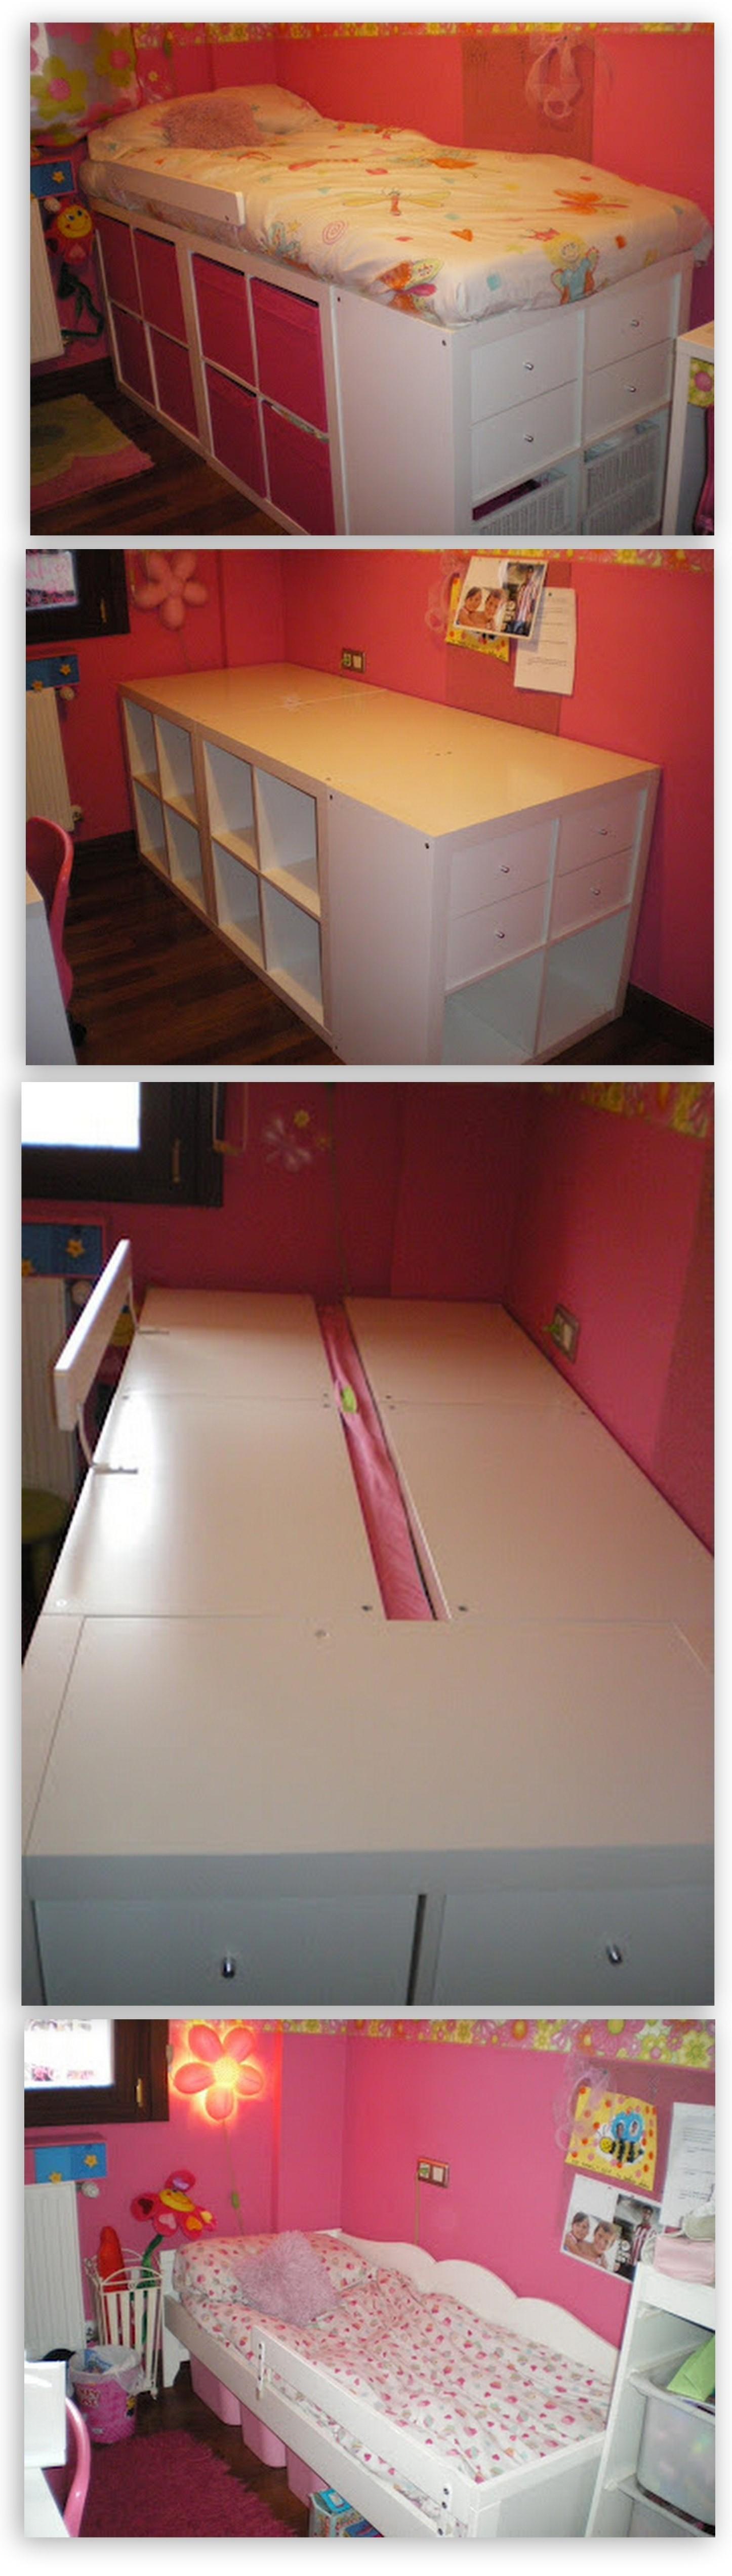 cama con estanterias de ikea